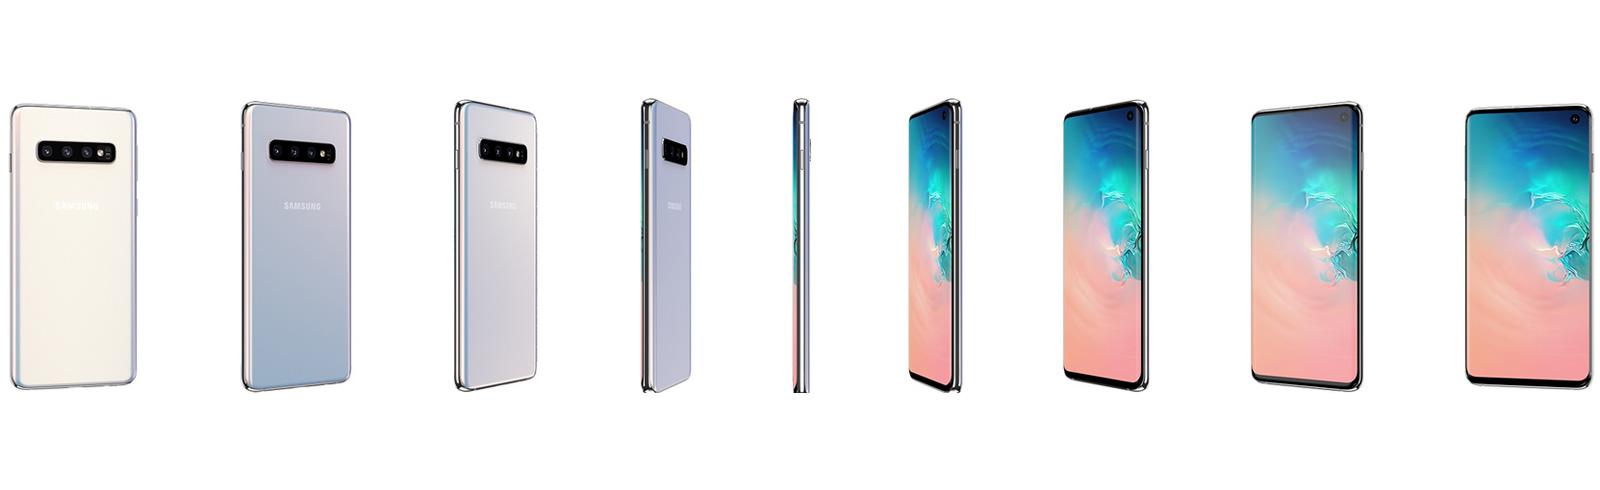 Samsung Galaxy S10 Exynos Review